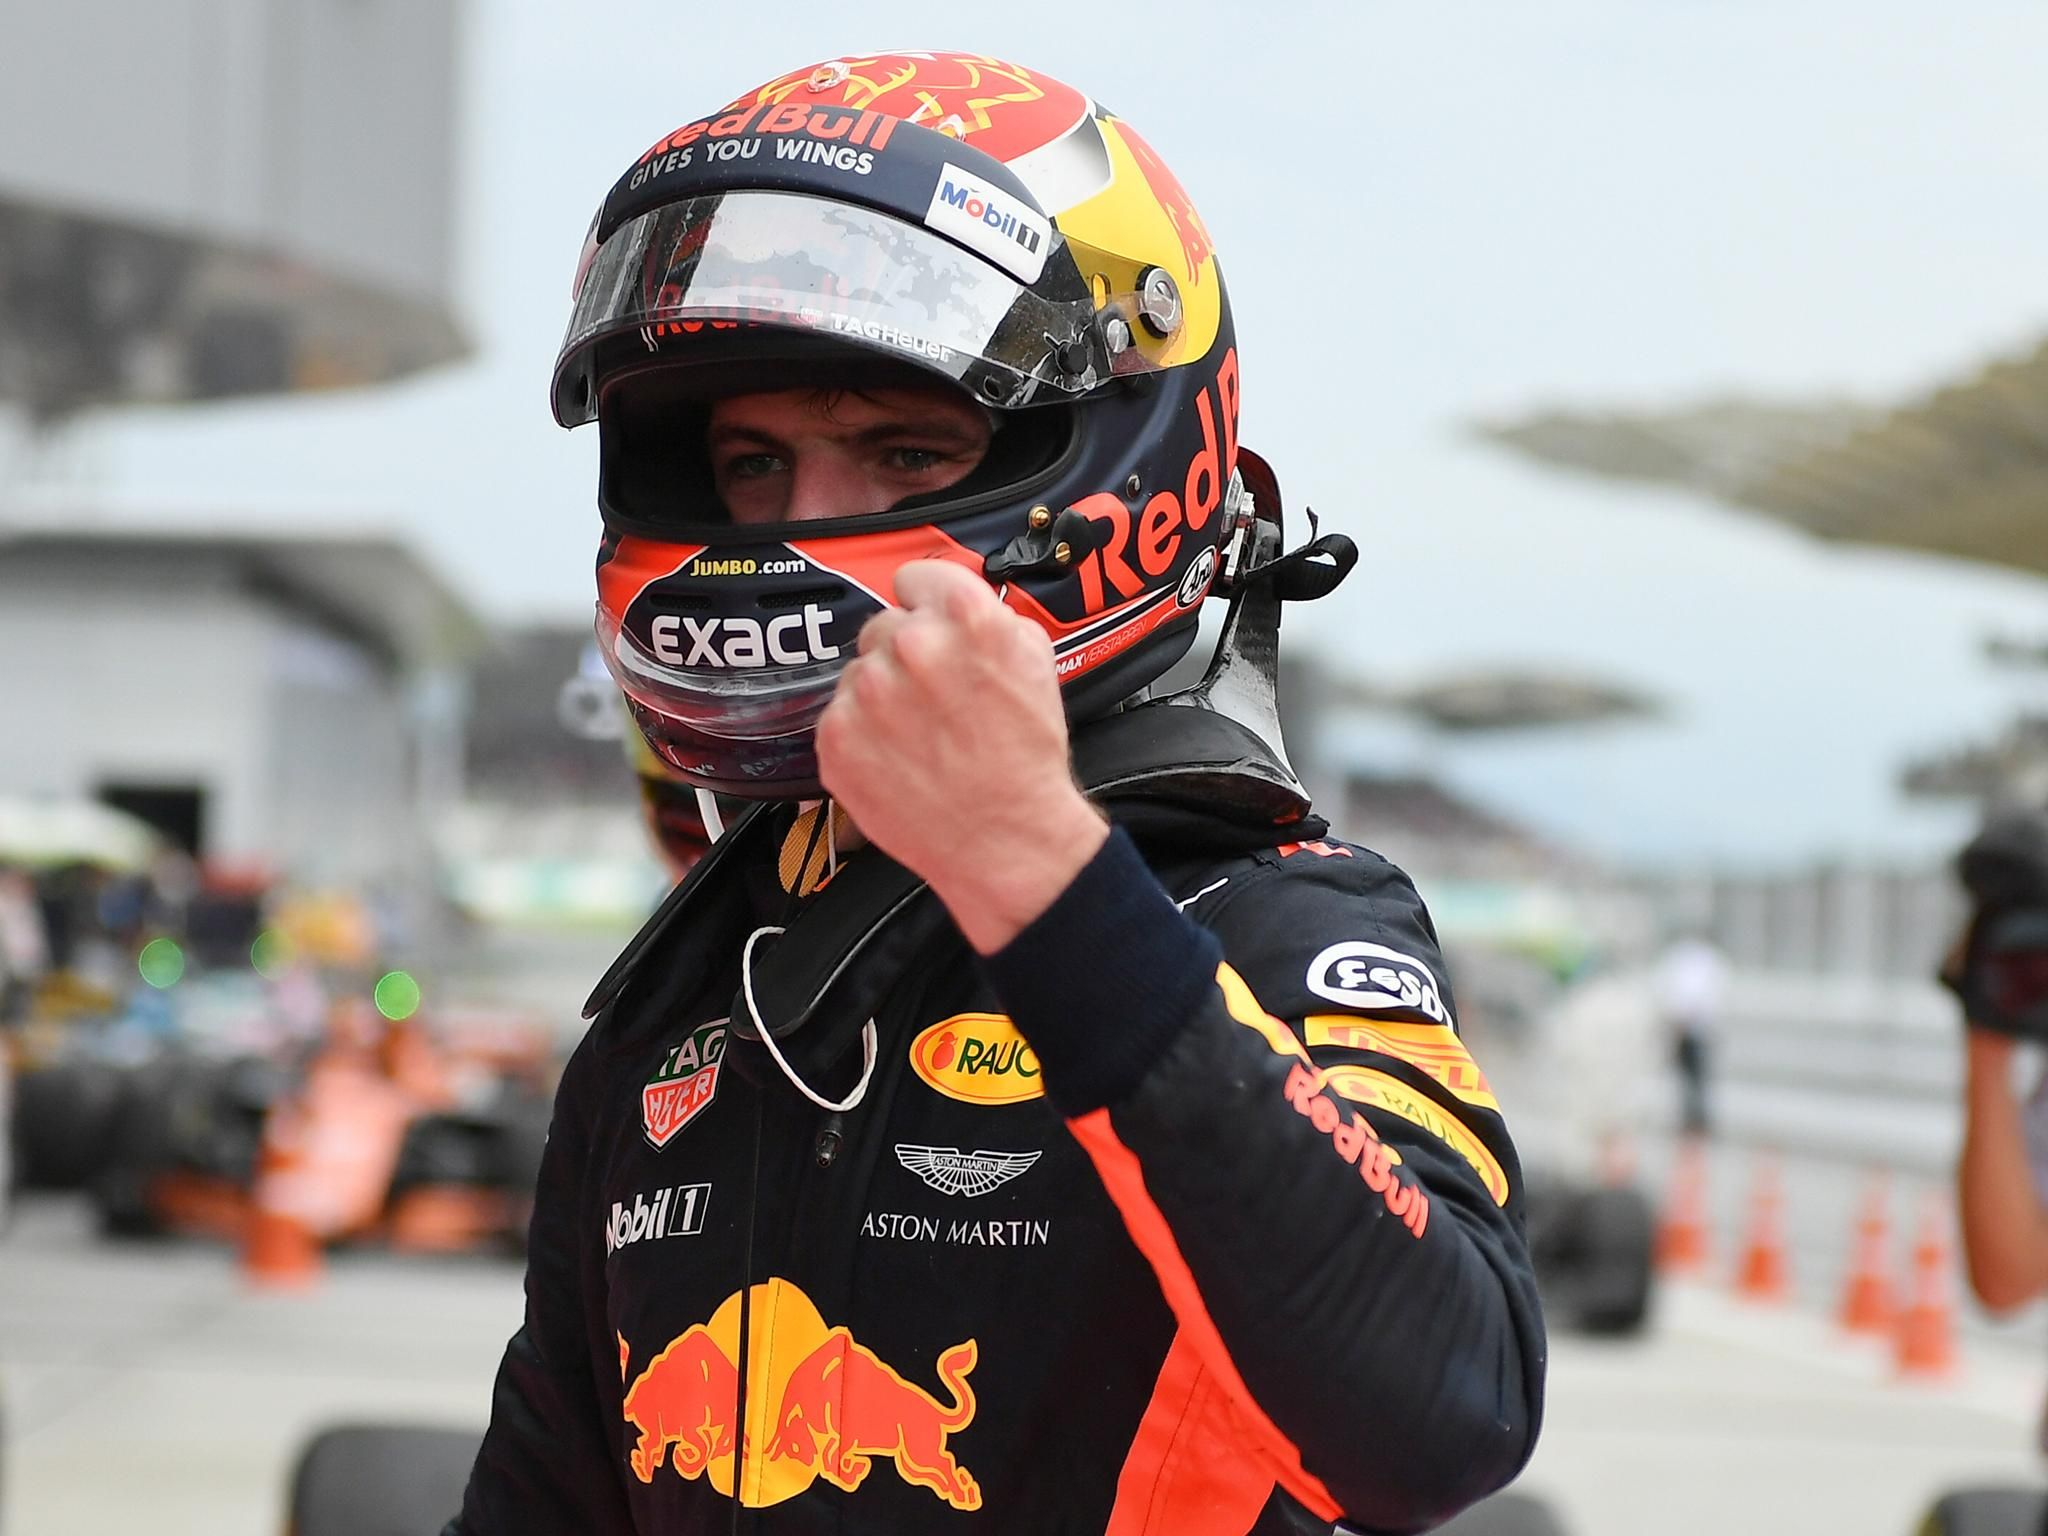 Max Verstappen Beats Lewis Hamilton As Sebastian Vettel Crashes After Finishing Fourth Max Verstappen Lewis Hamilton Max